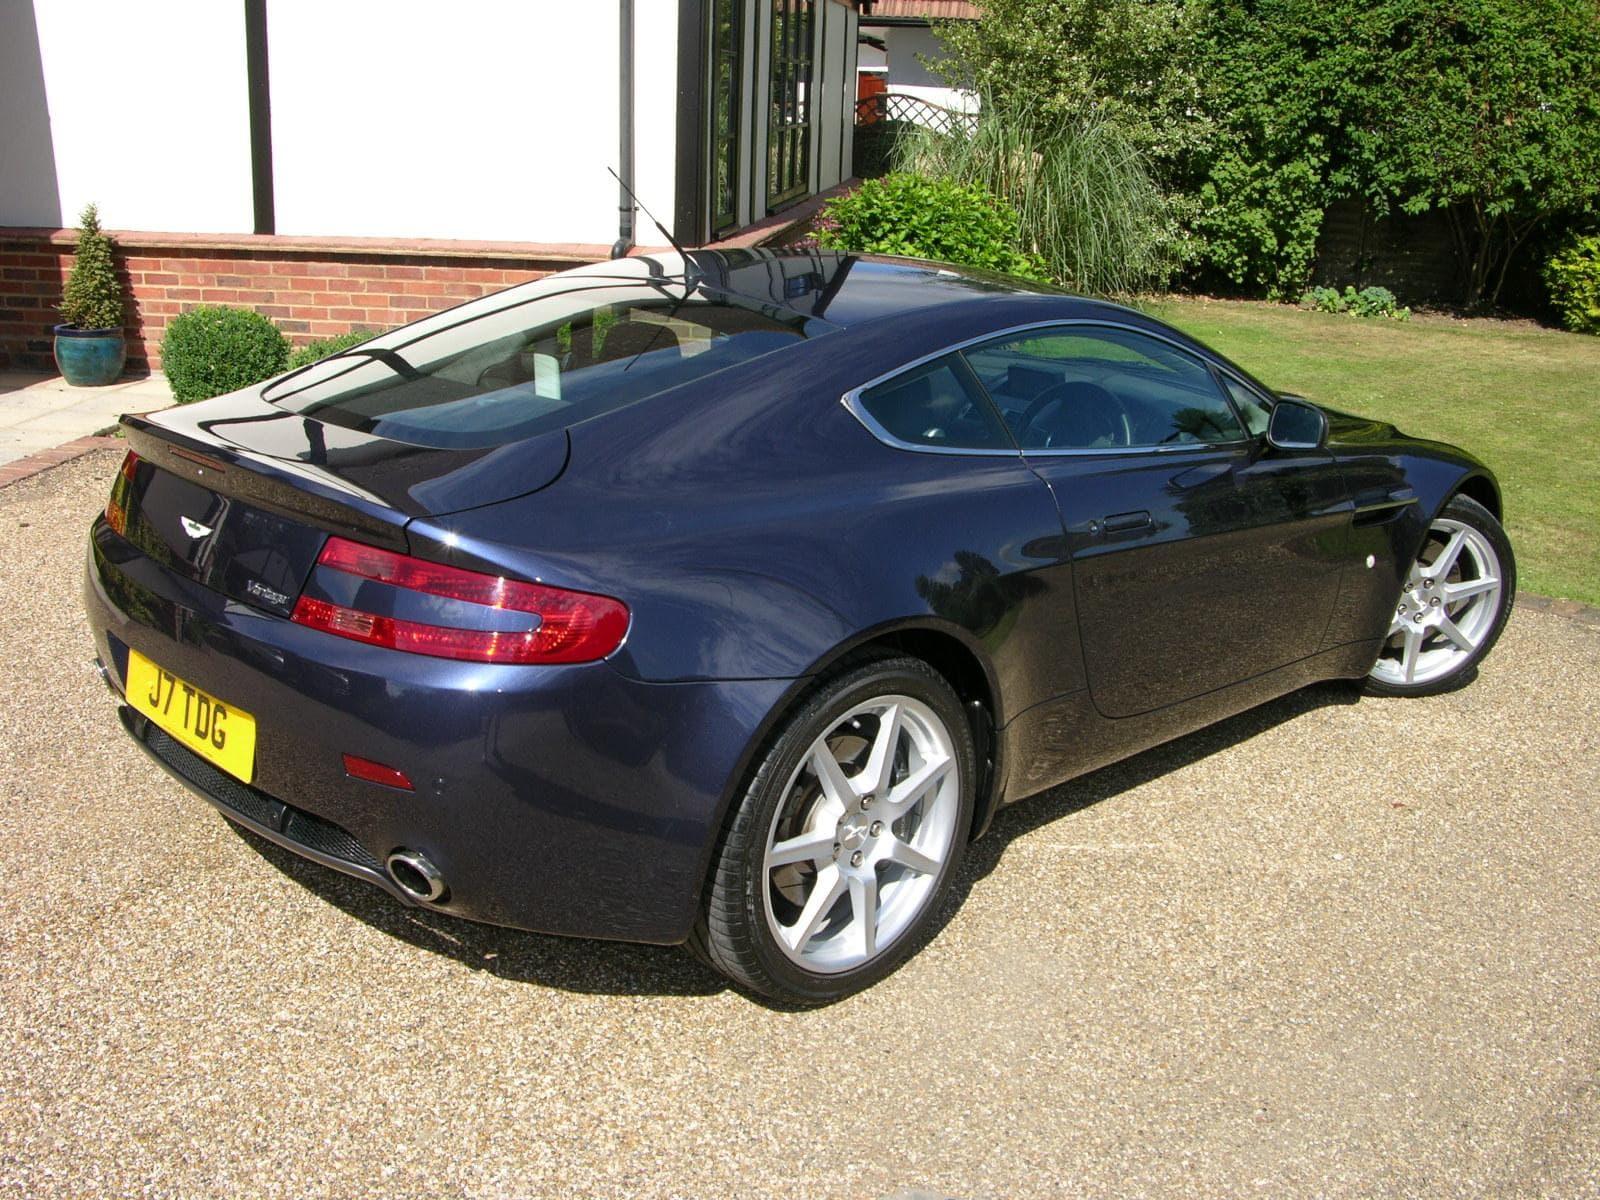 2006 Aston Martin V8 Vantage HD pics